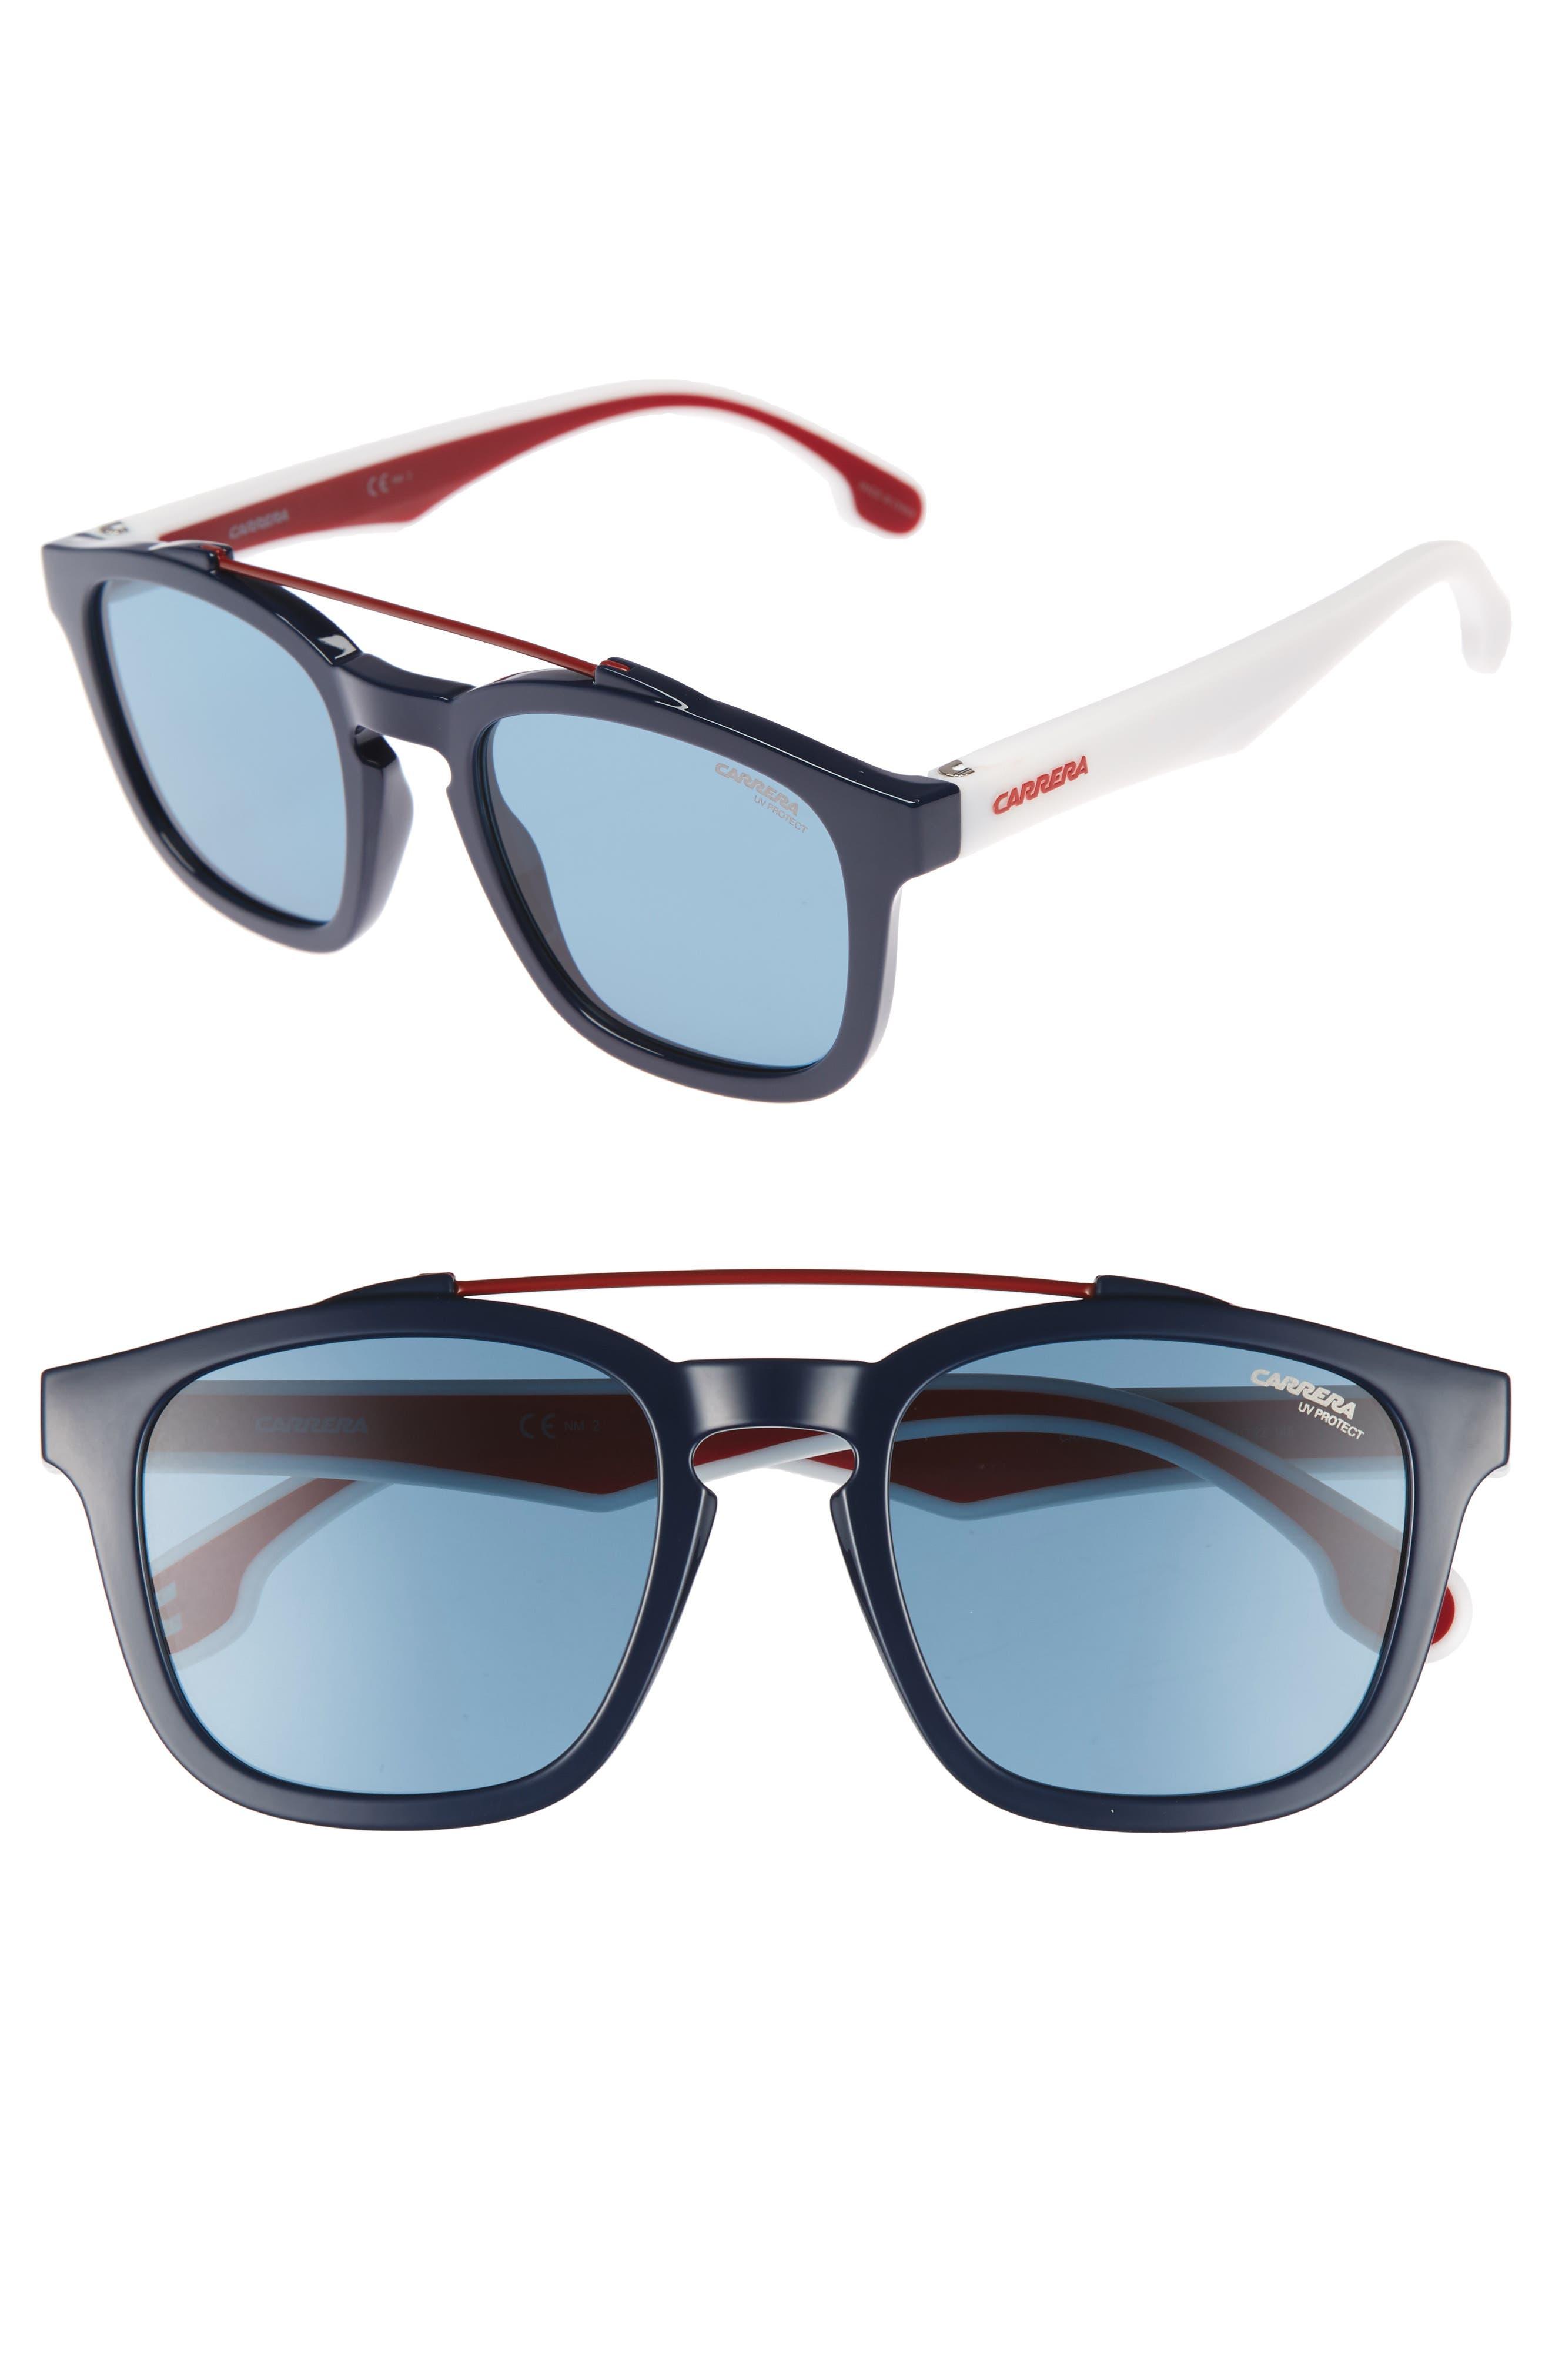 Main Image - Carrera Eyewear 1011S Sunglasses